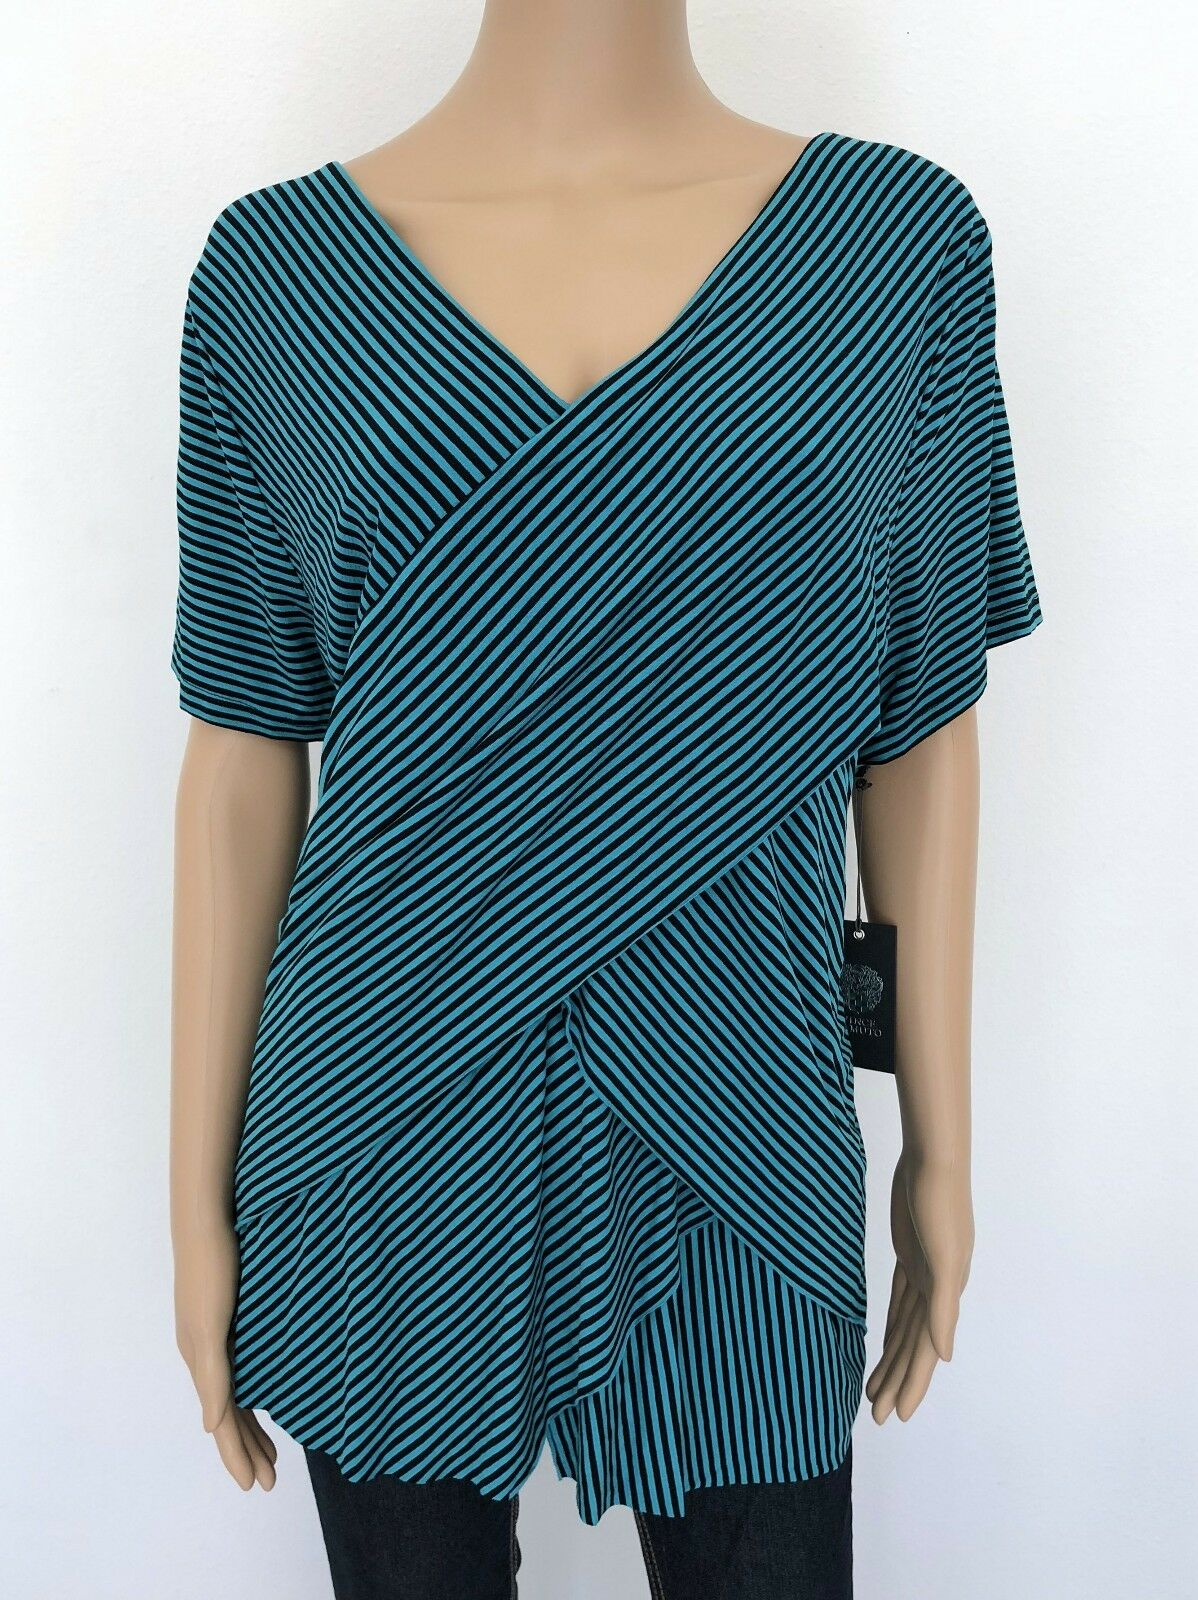 NWT  VINCE CAMUTO Plus Größe 3X Blau schwarz Striped T-Shirt Top Blouse Woherren